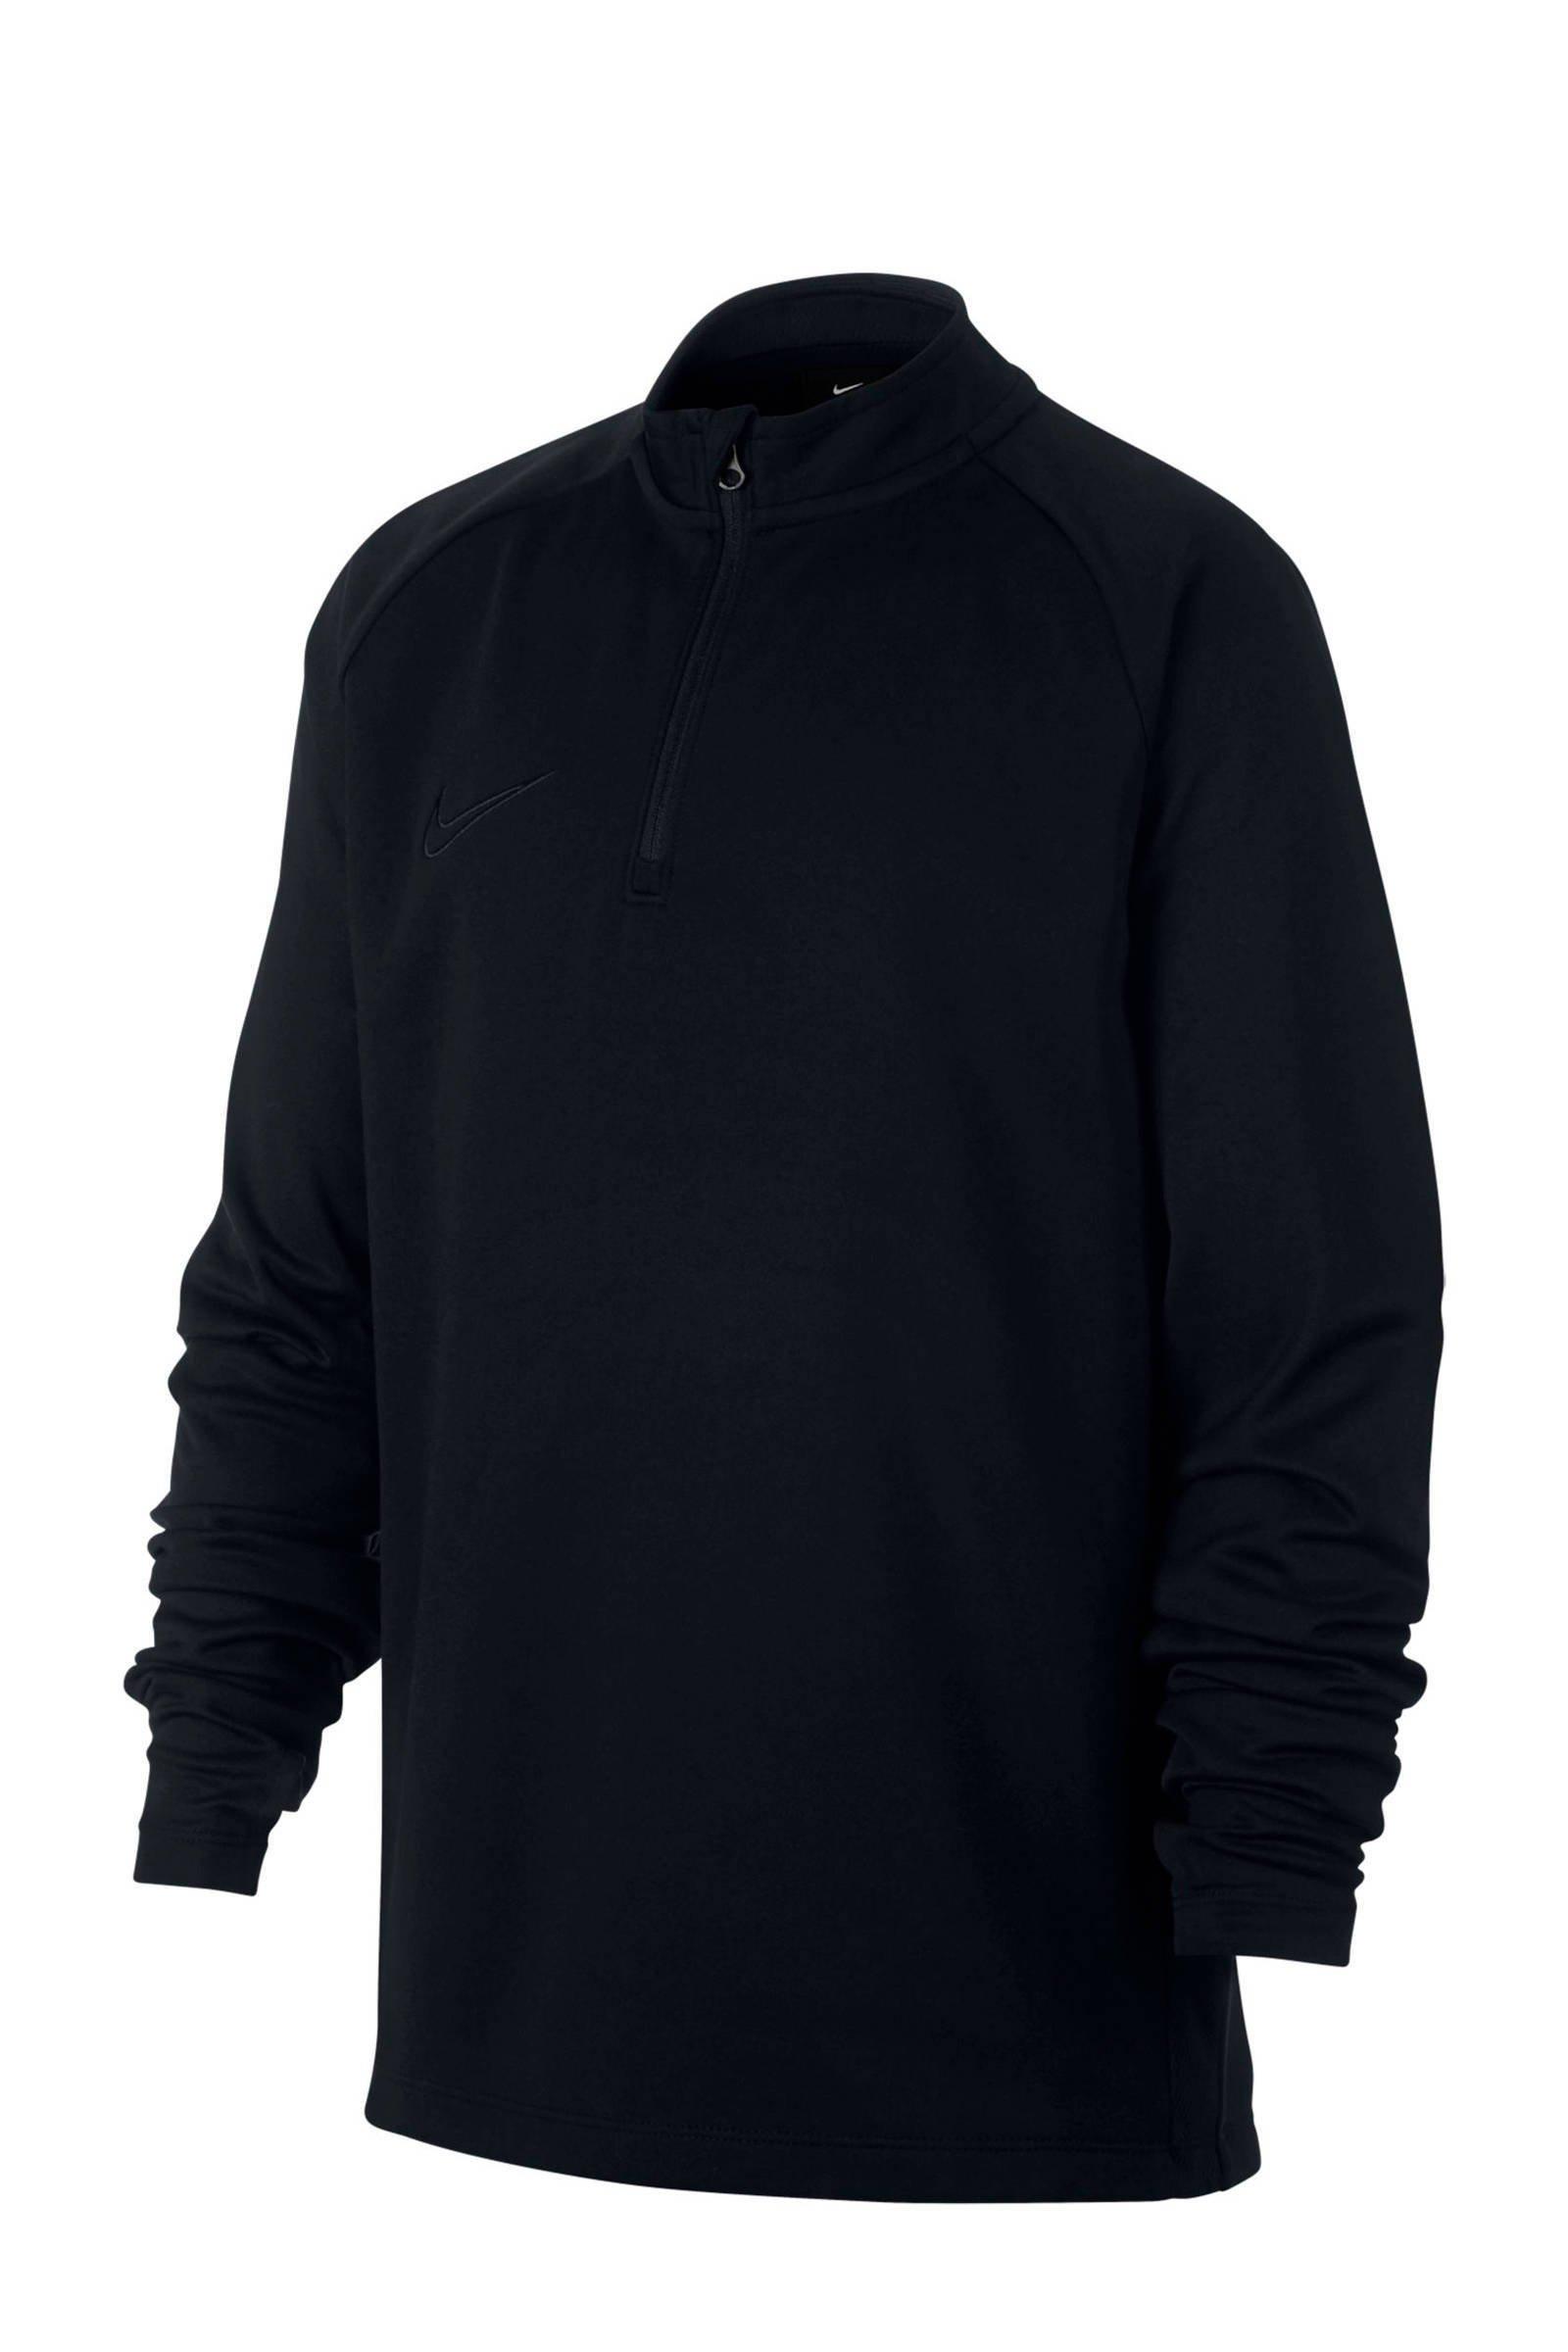 Nike voetbalshirt zwart - maat 152/158